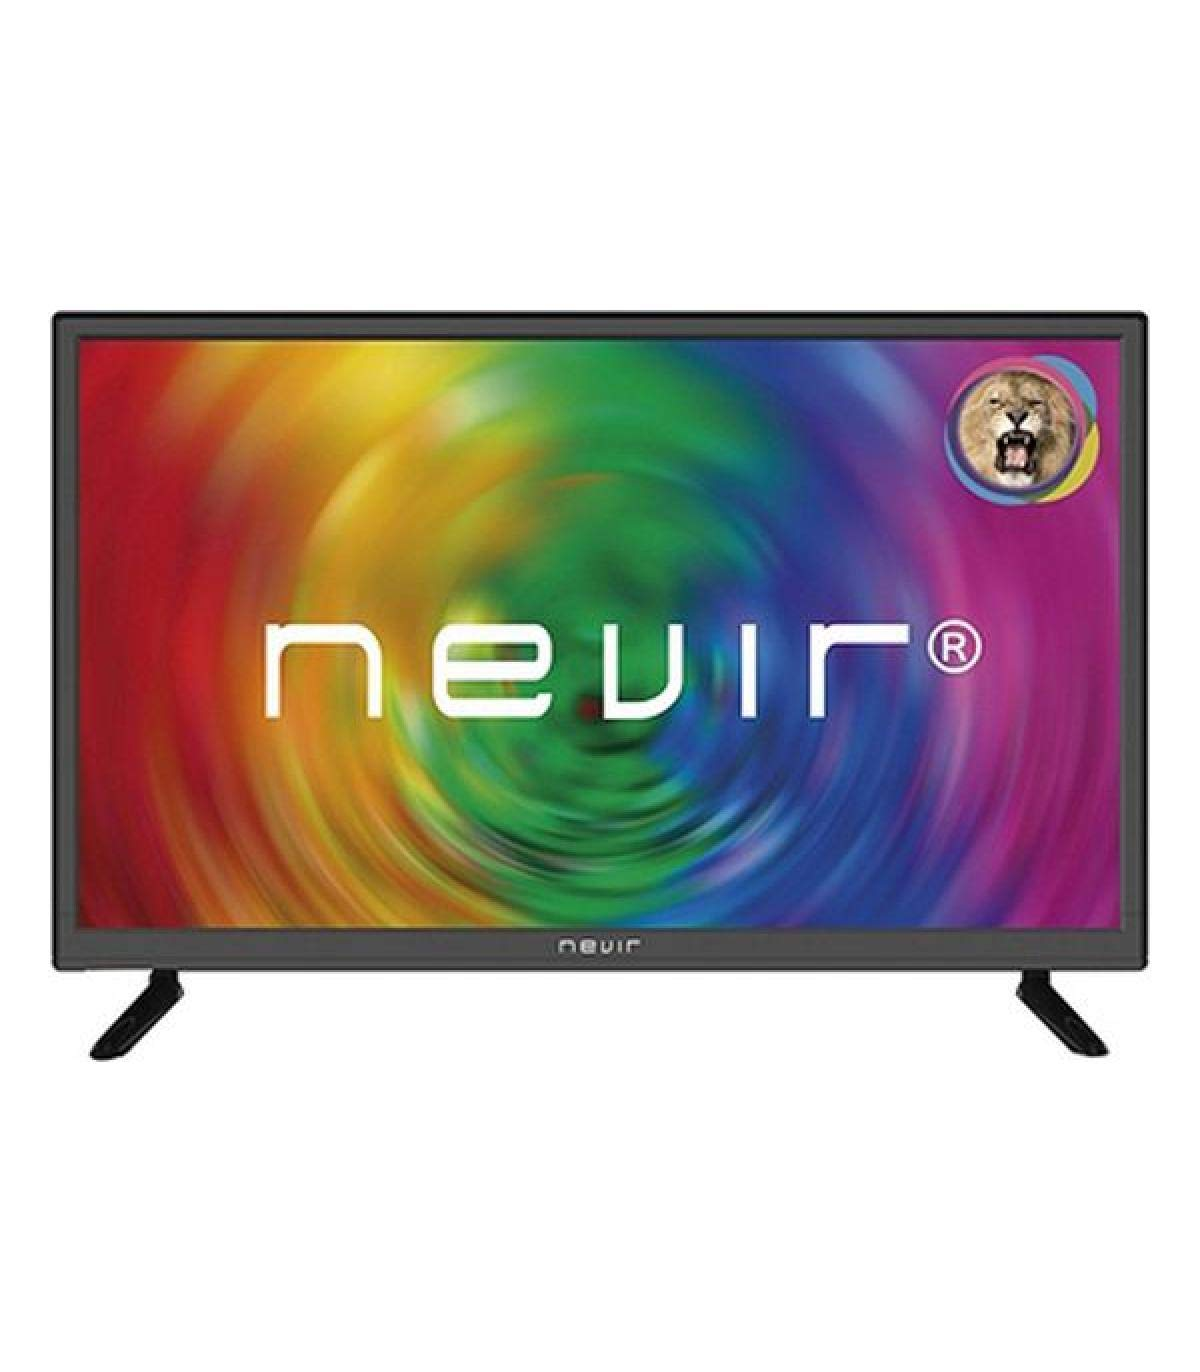 TV LED 24 Nevir NVR-7707-24RD2-N HD Ready - TV LED: BLOCK ...